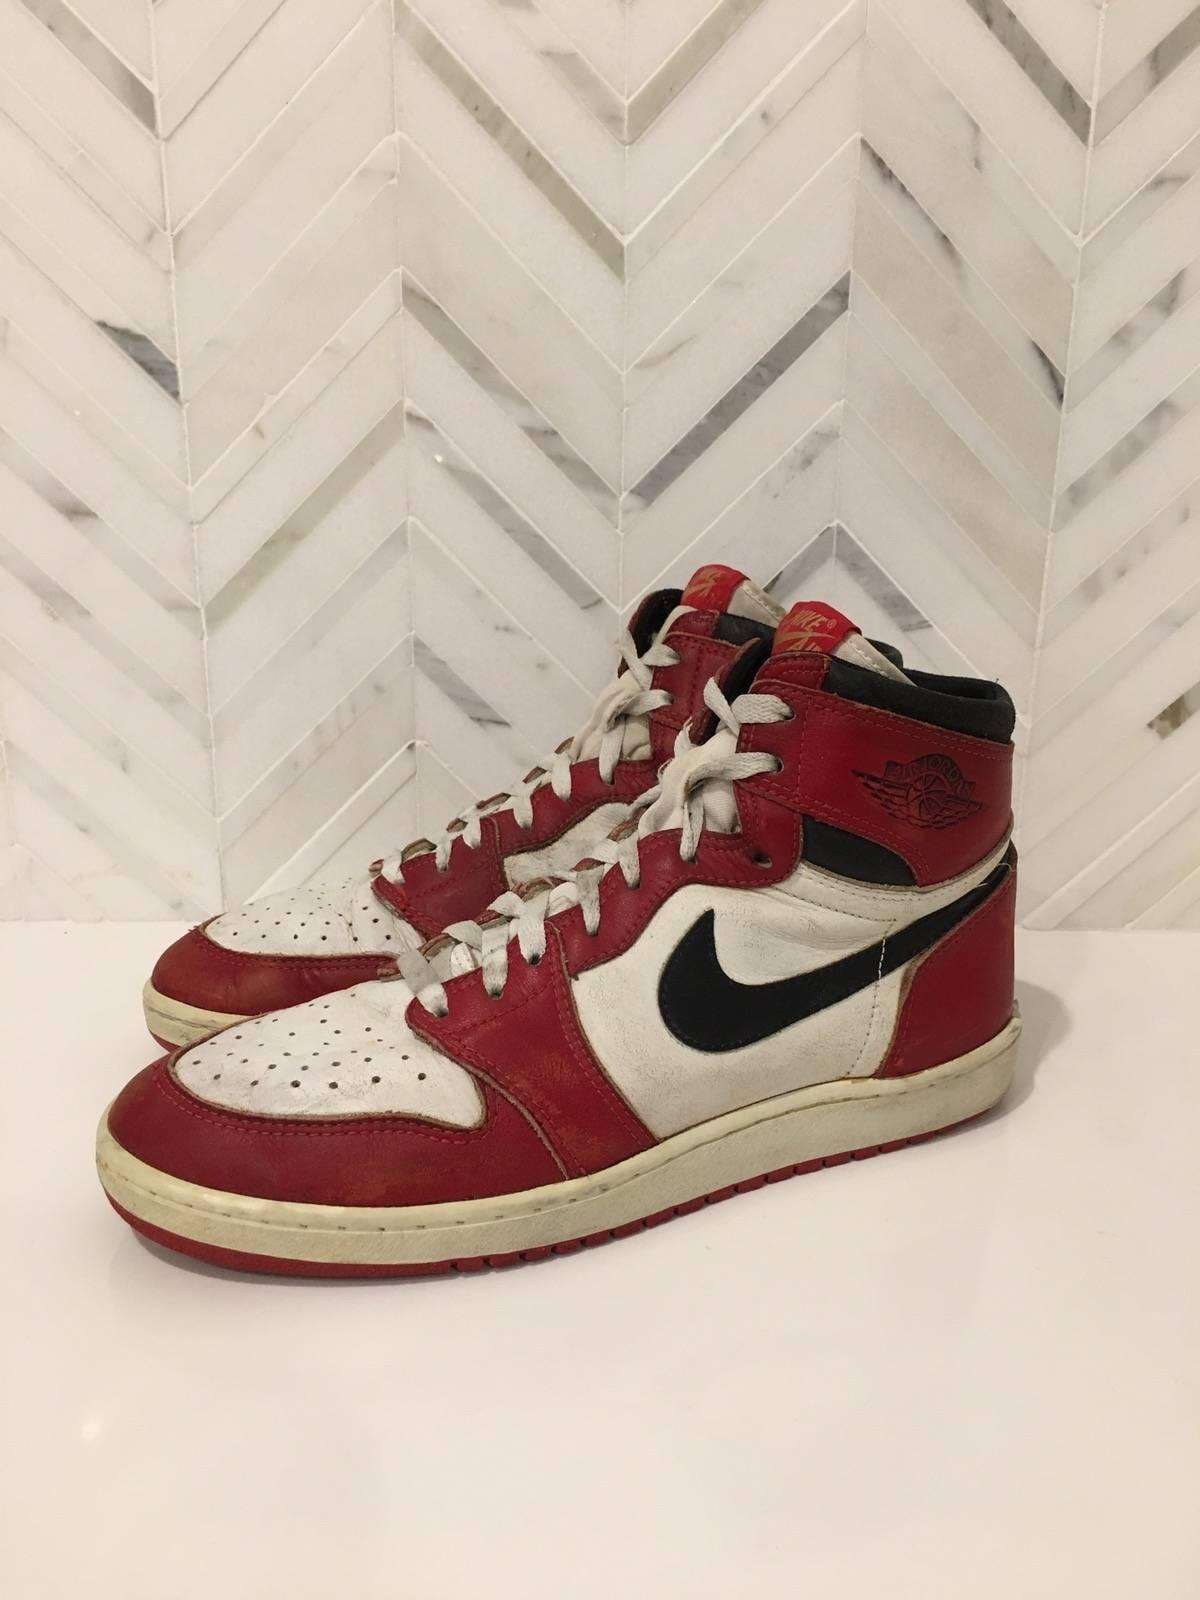 revendeur 6d246 3c3da Nike 1985 Air Jordan 1 'chicago' Size 10.5 $999